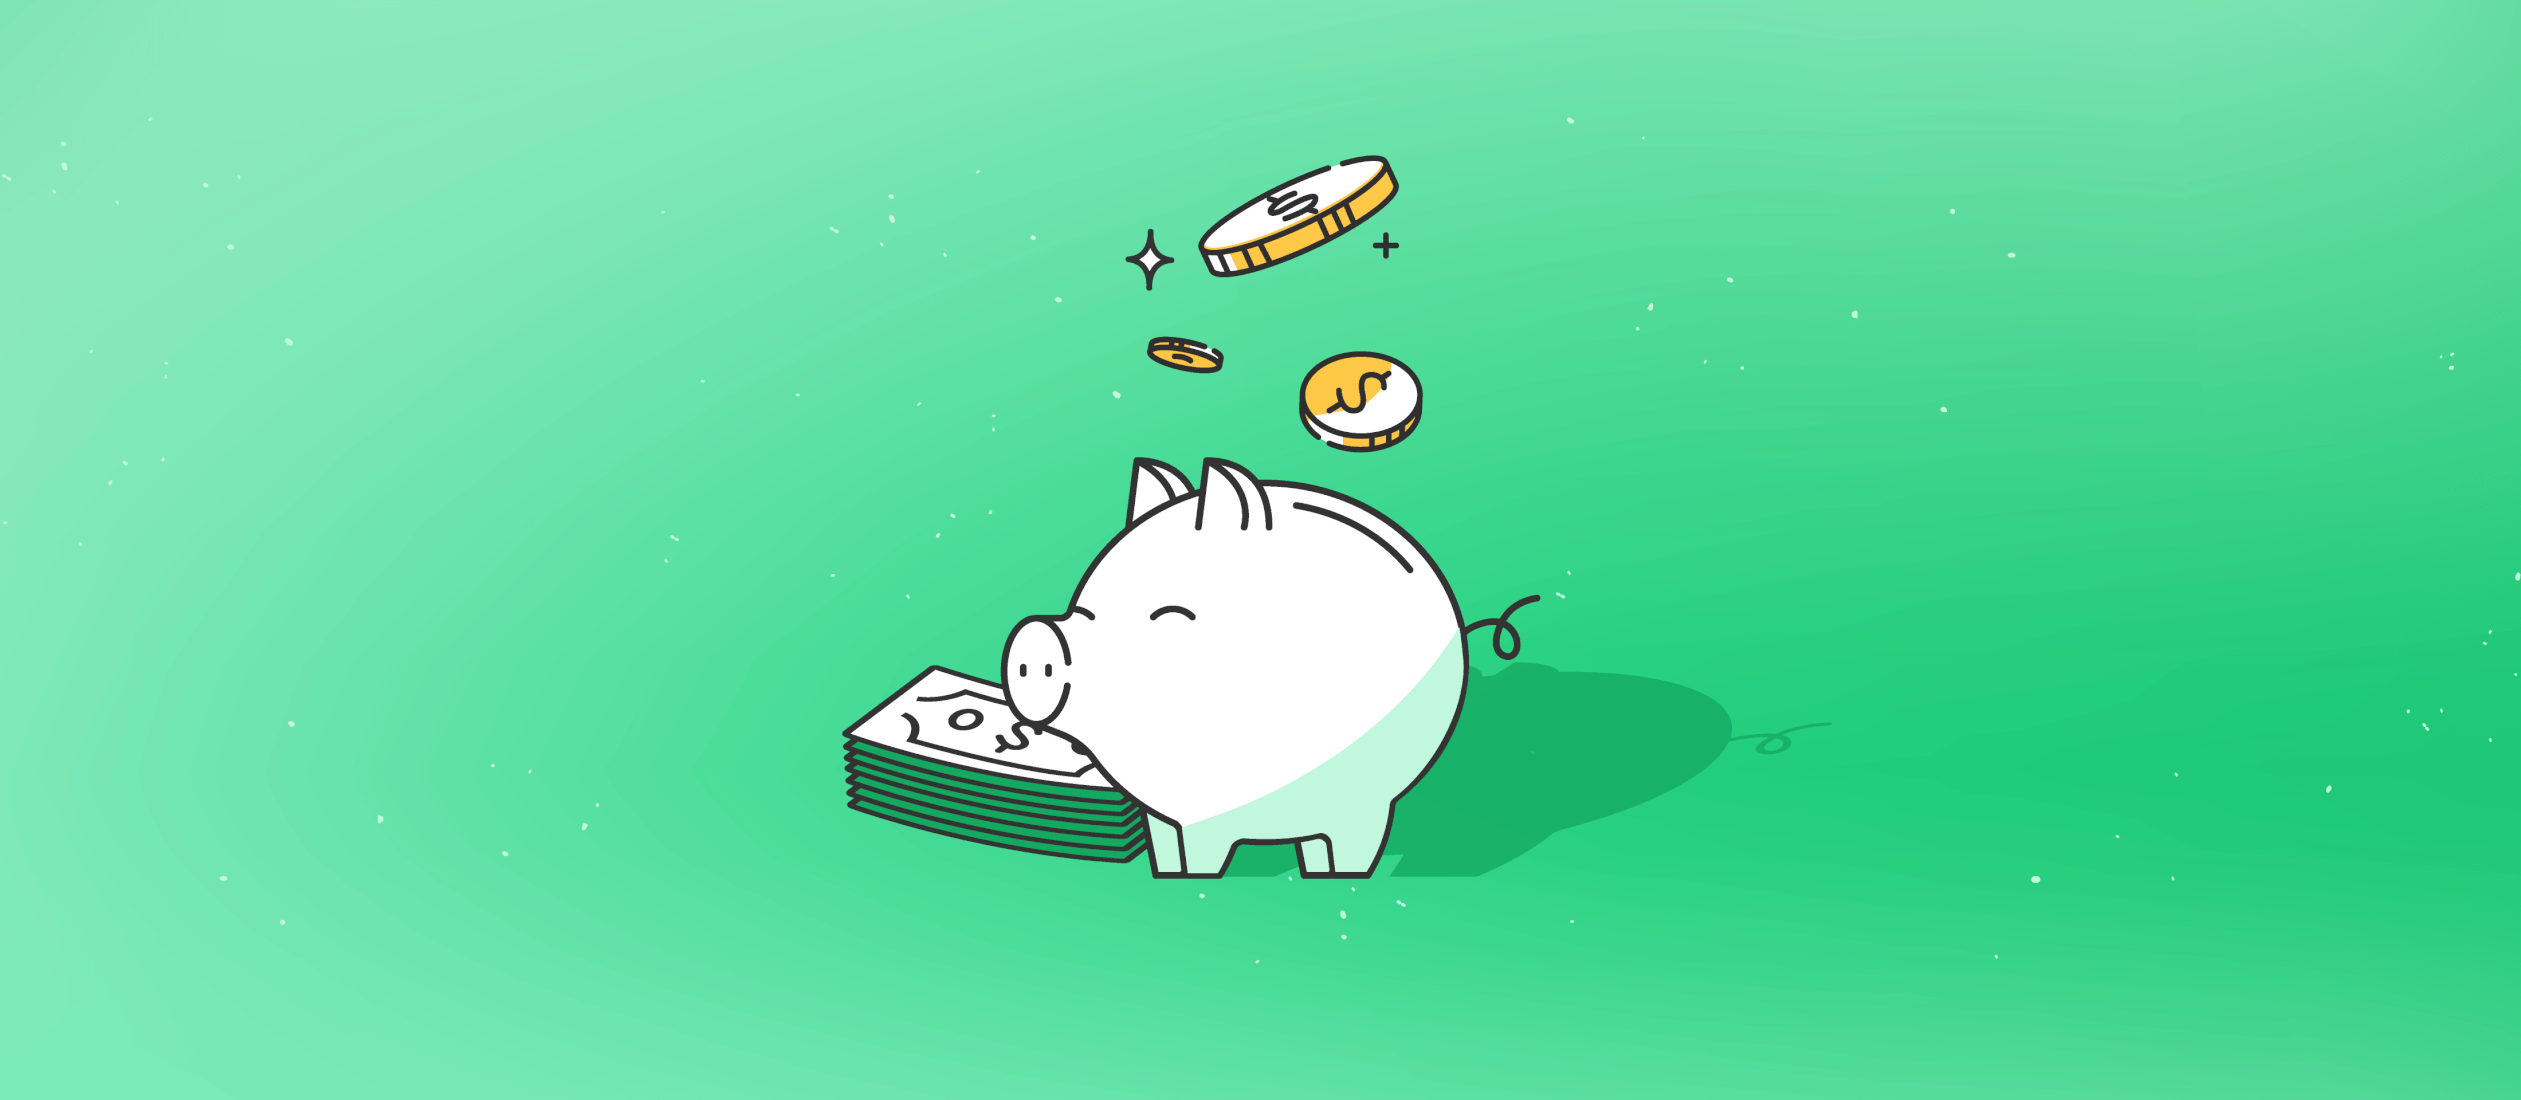 saving money in a piggy bank illustration